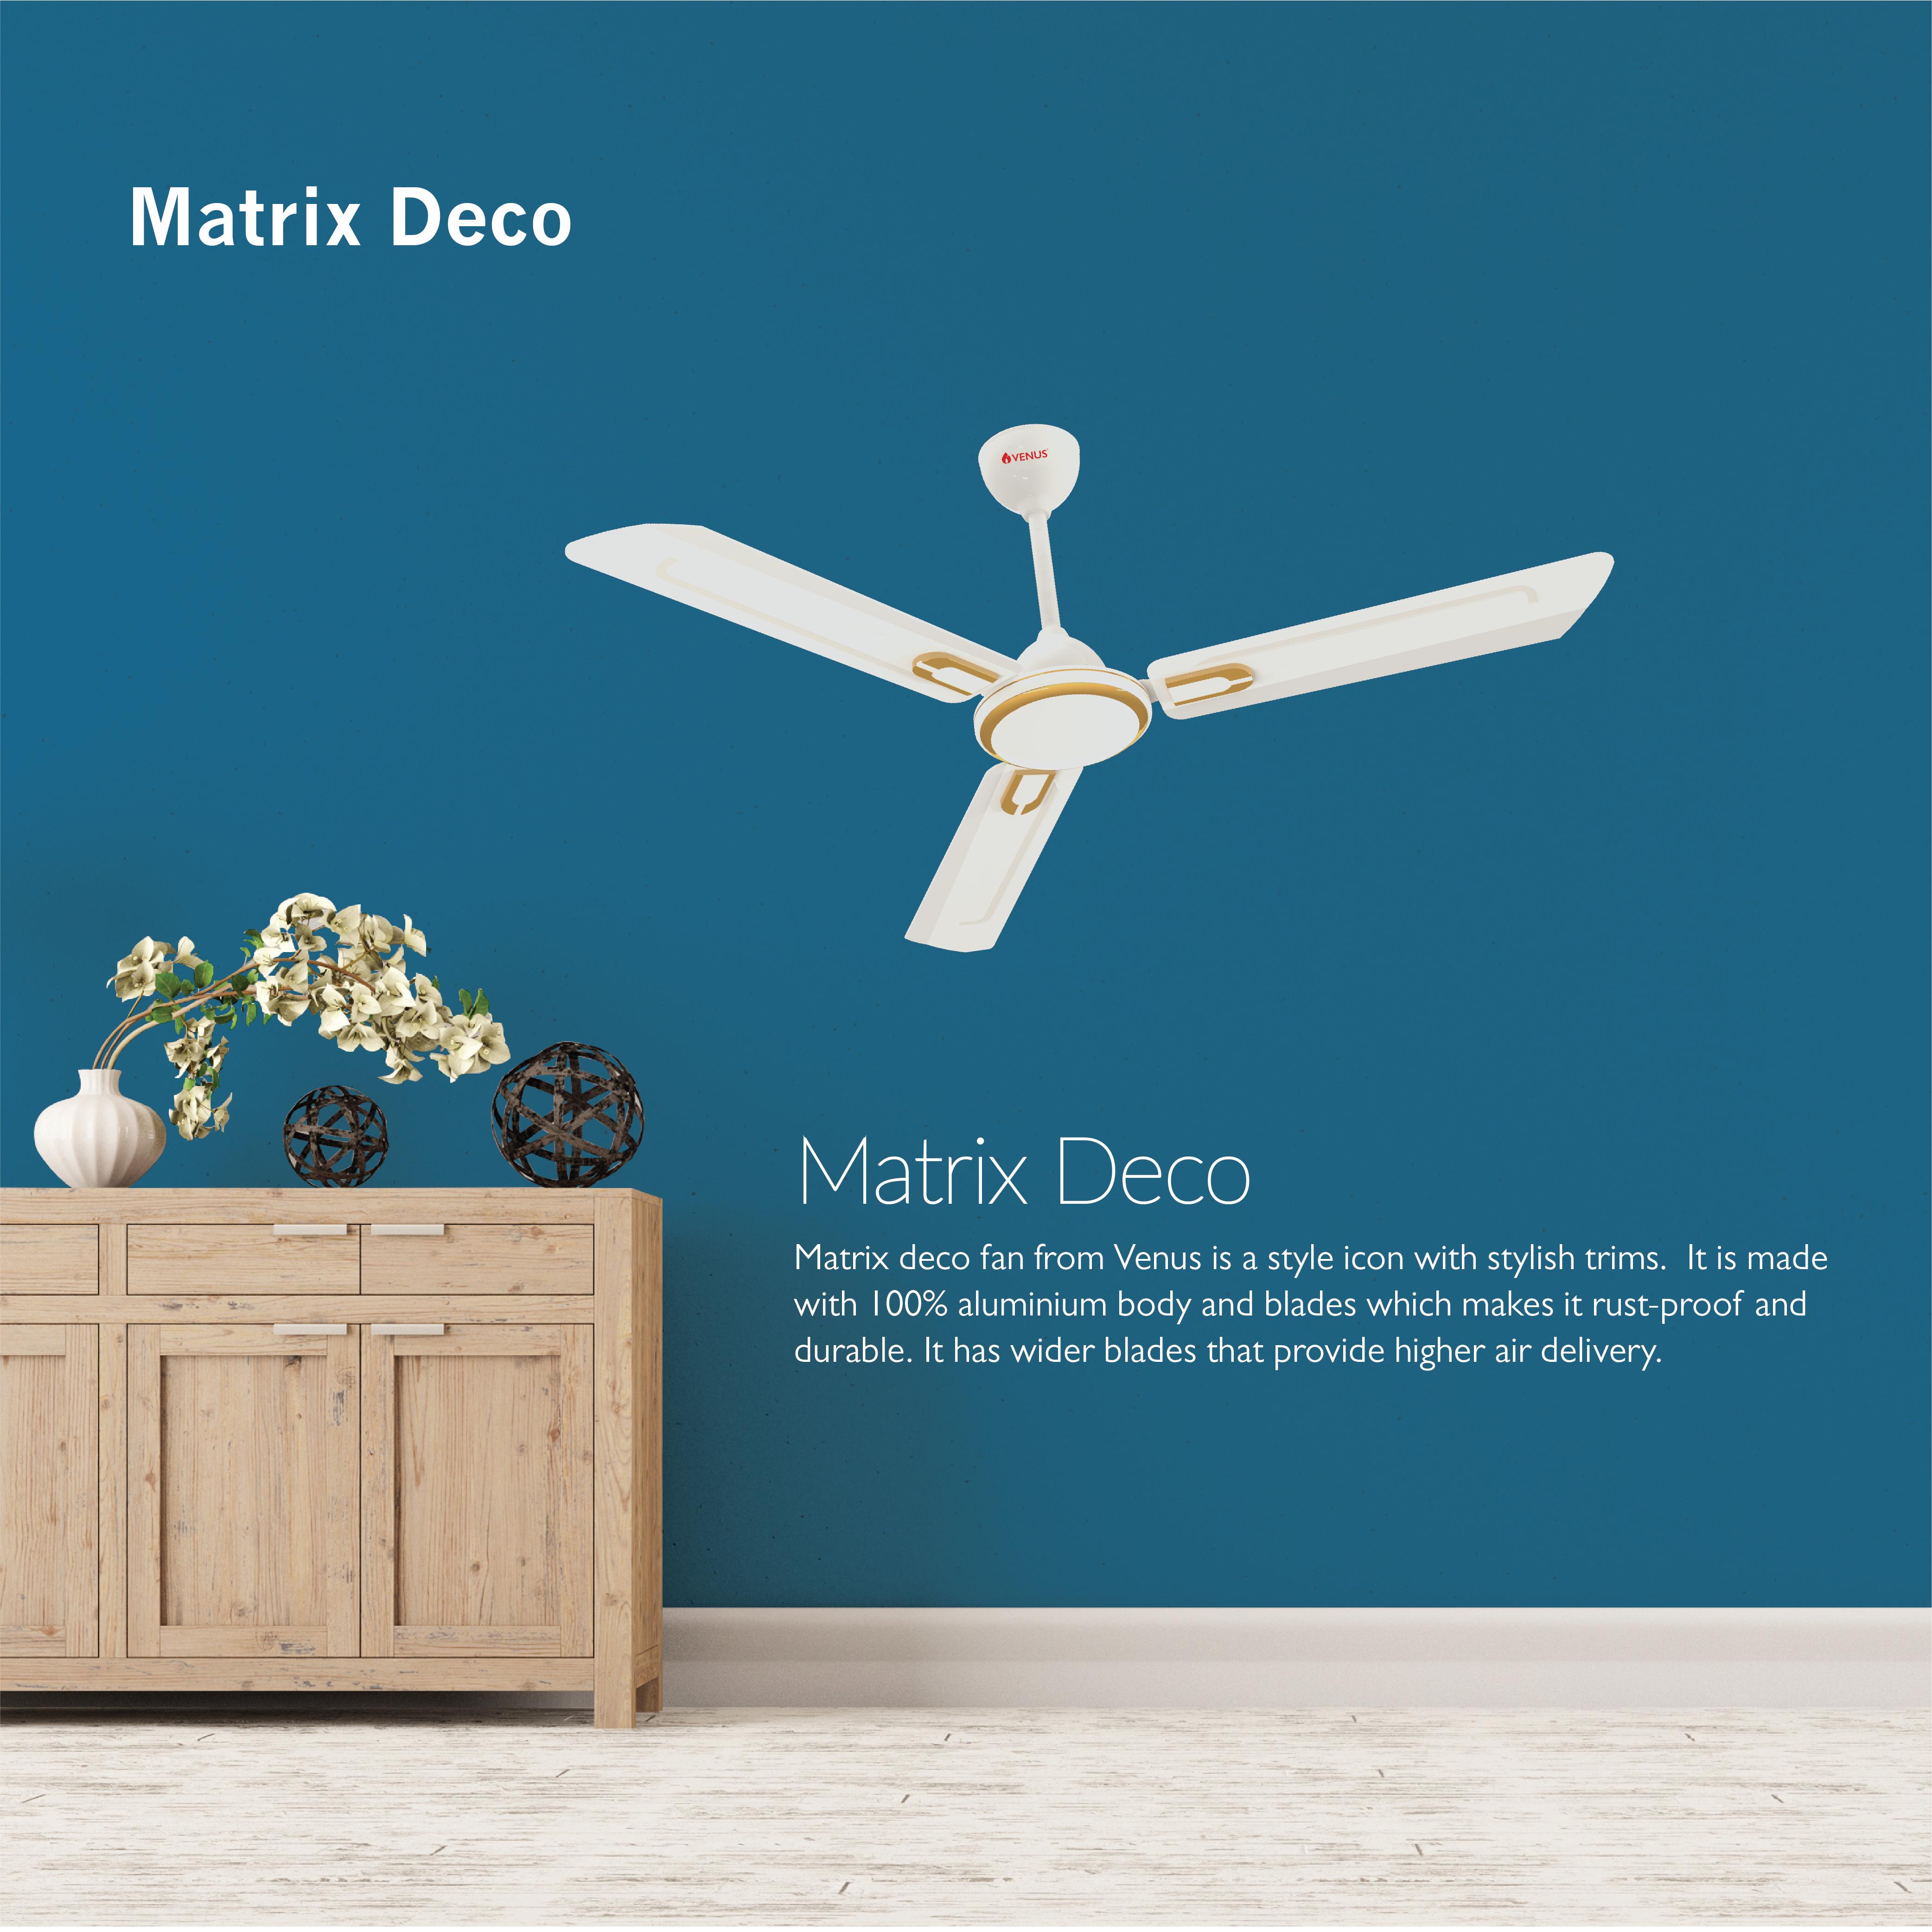 Decorative Collection - Matrix Deco